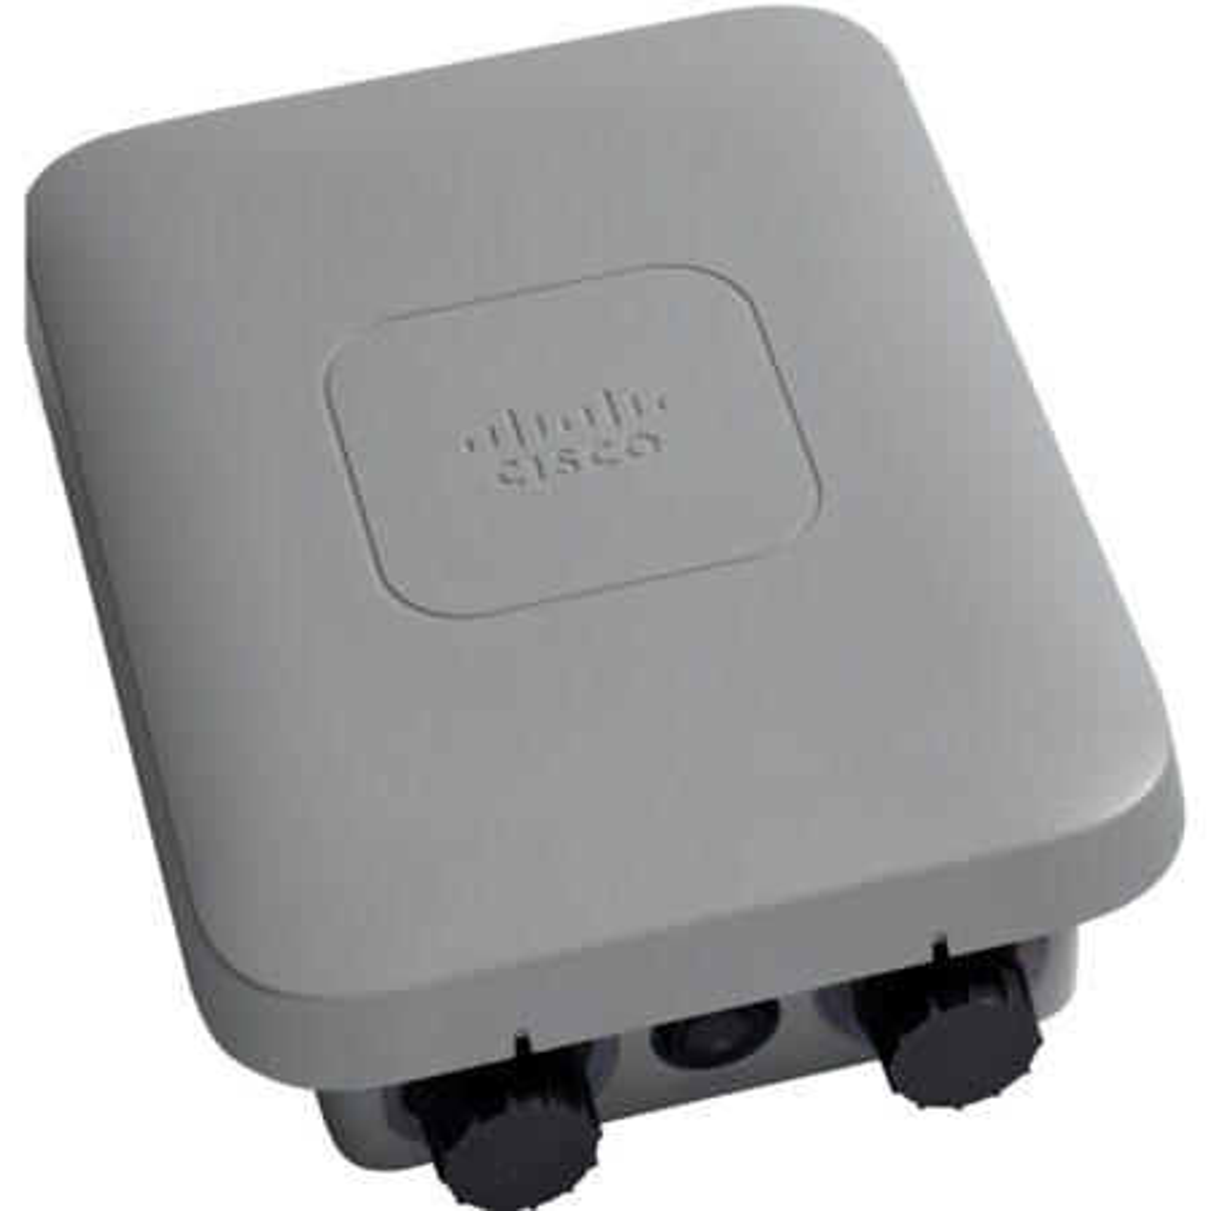 Cisco Aironet 1542D IEEE 802.11ac 1.10 Gbit/s Wireless Access Point